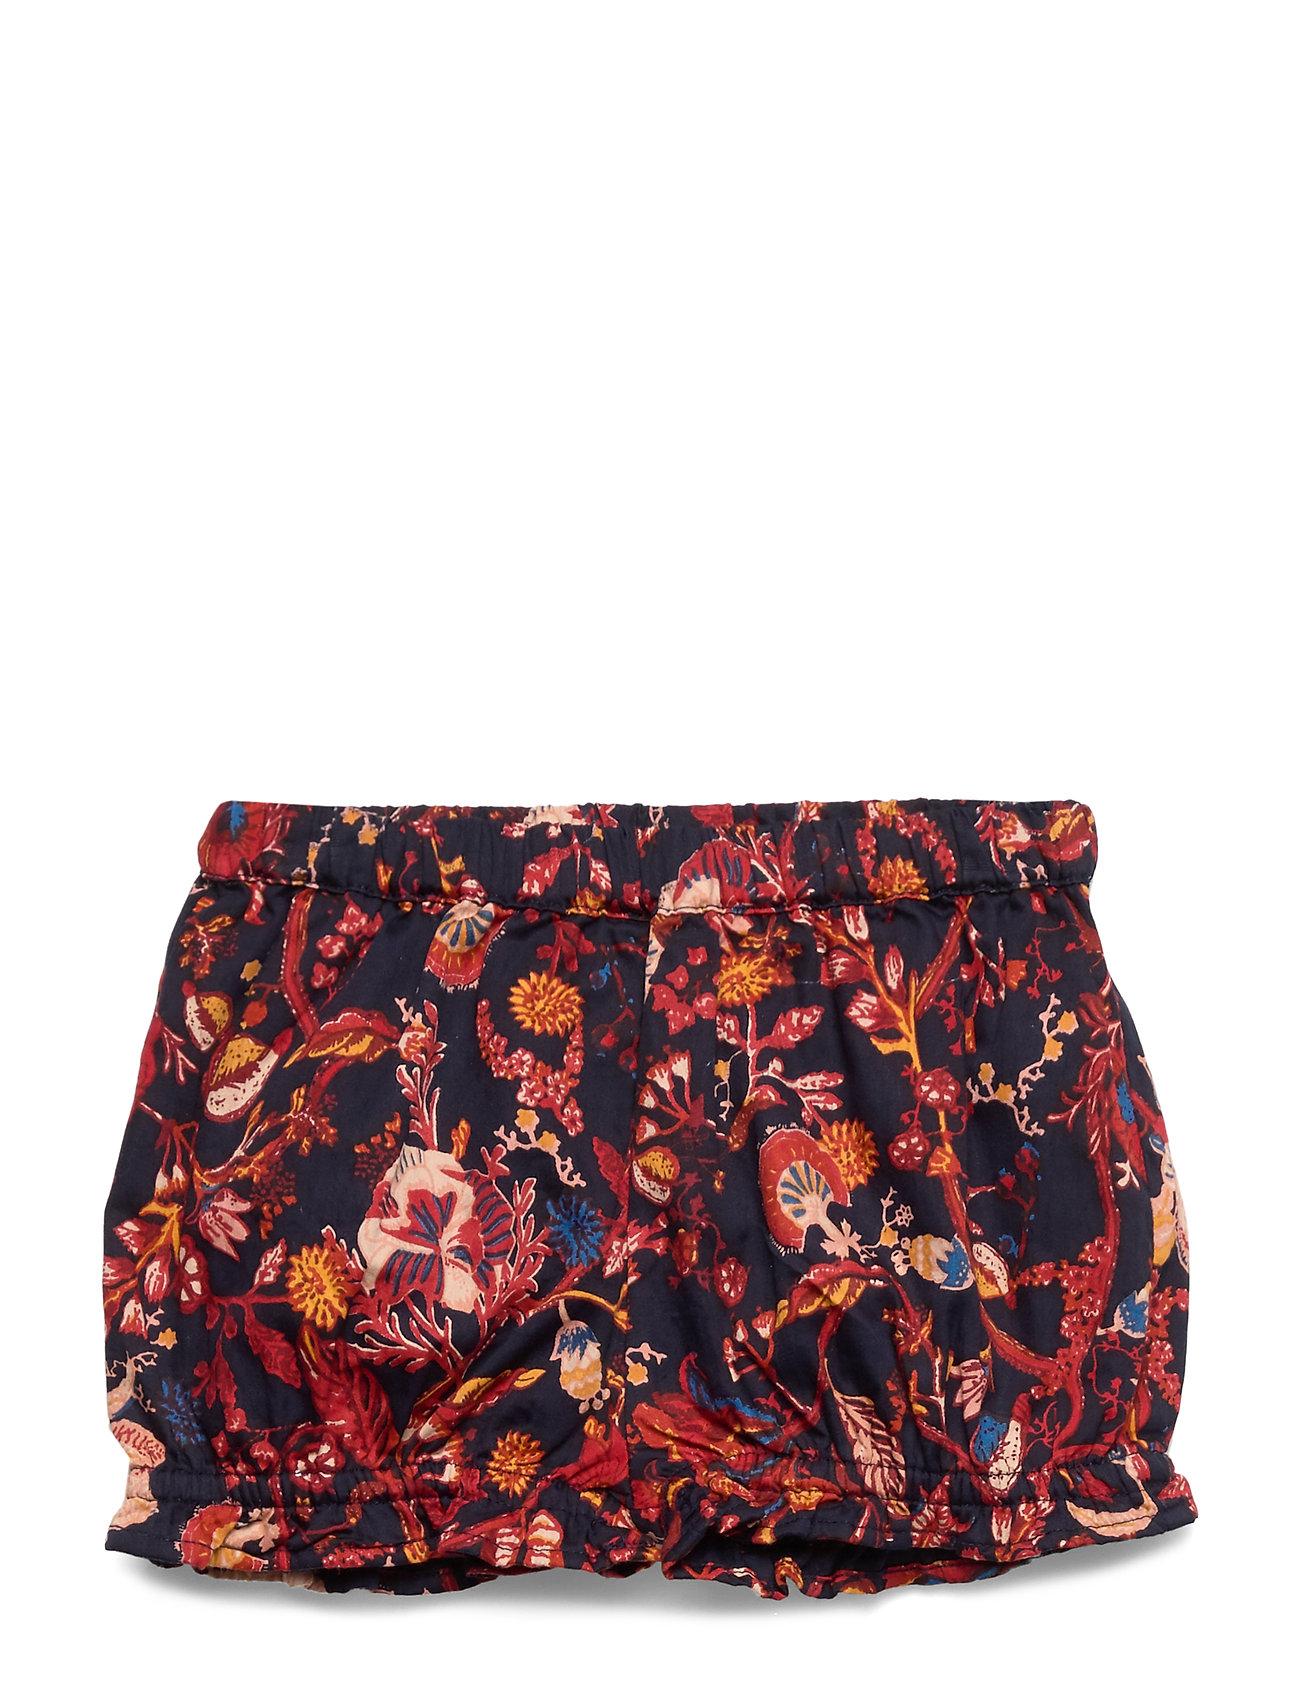 Noa Noa Miniature Shorts - NAVY BLAZER